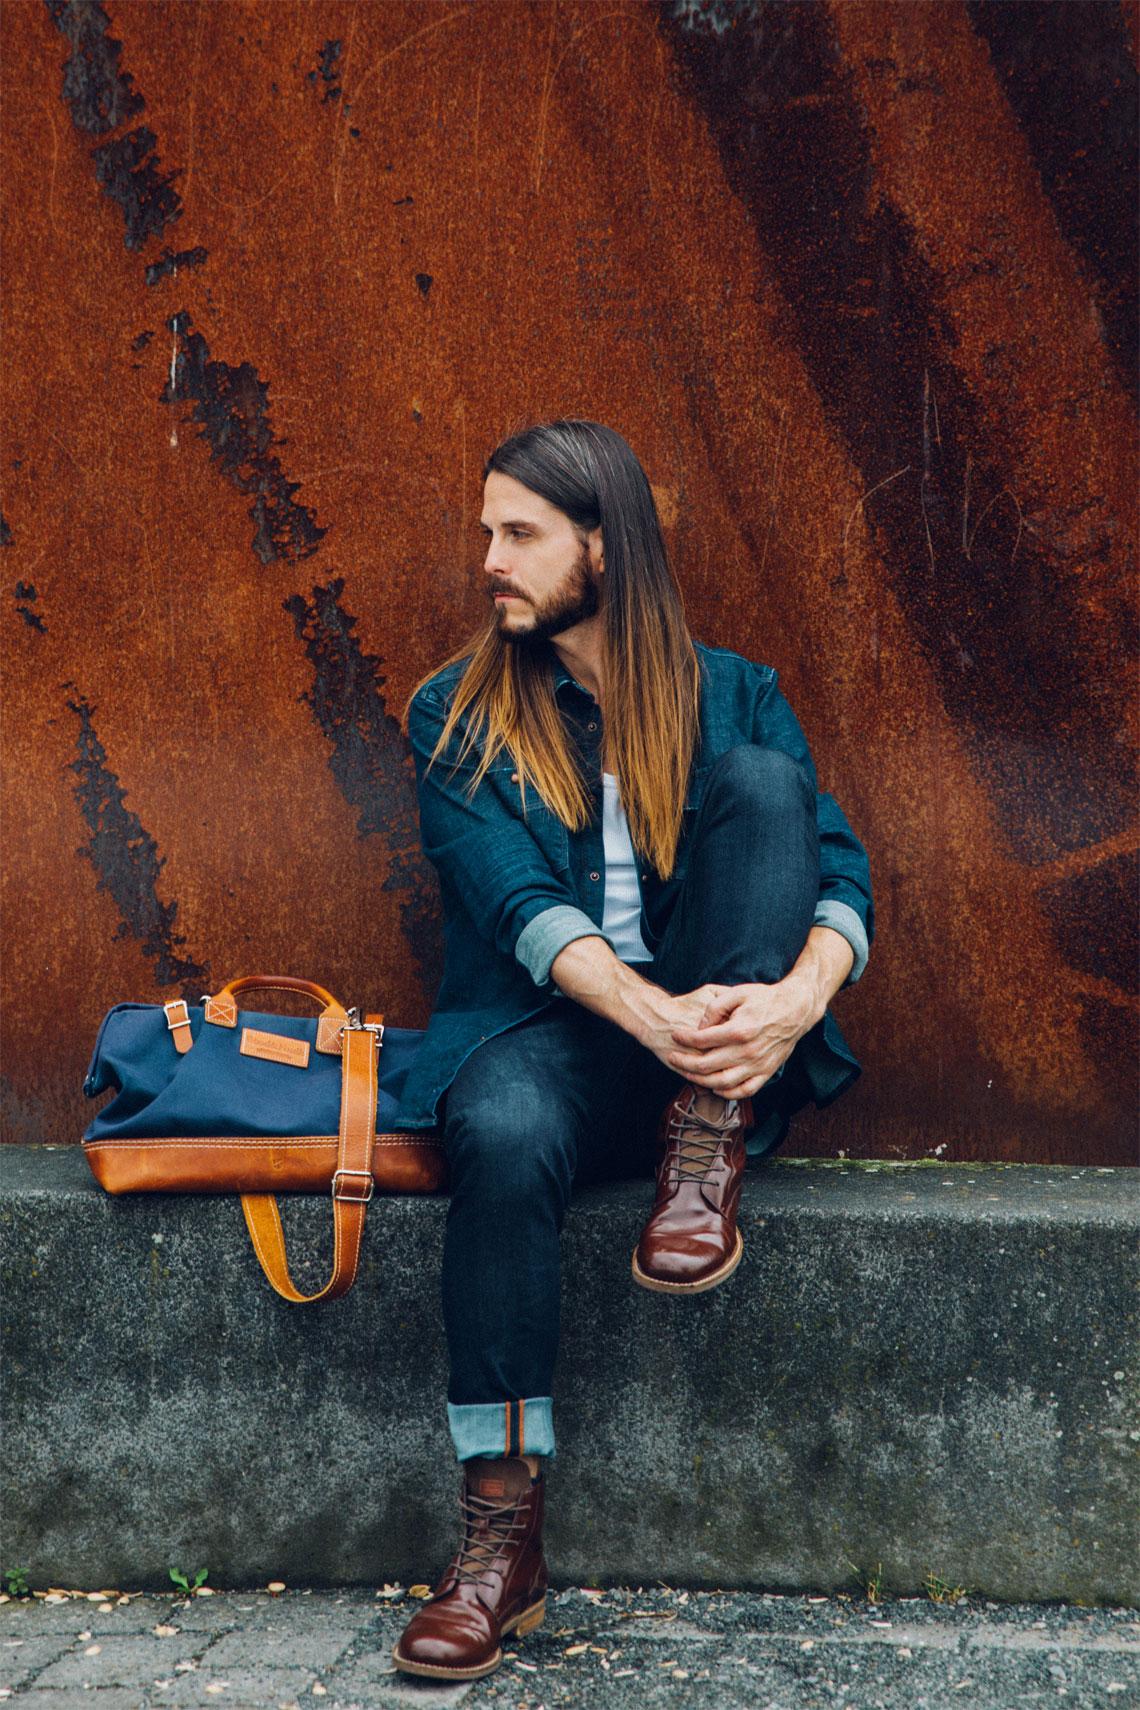 Modeblog-Männer-Fashion-Kaisers-neue-Kleider-Denim-Outfit-Cross-Jeans-Boots-Preview